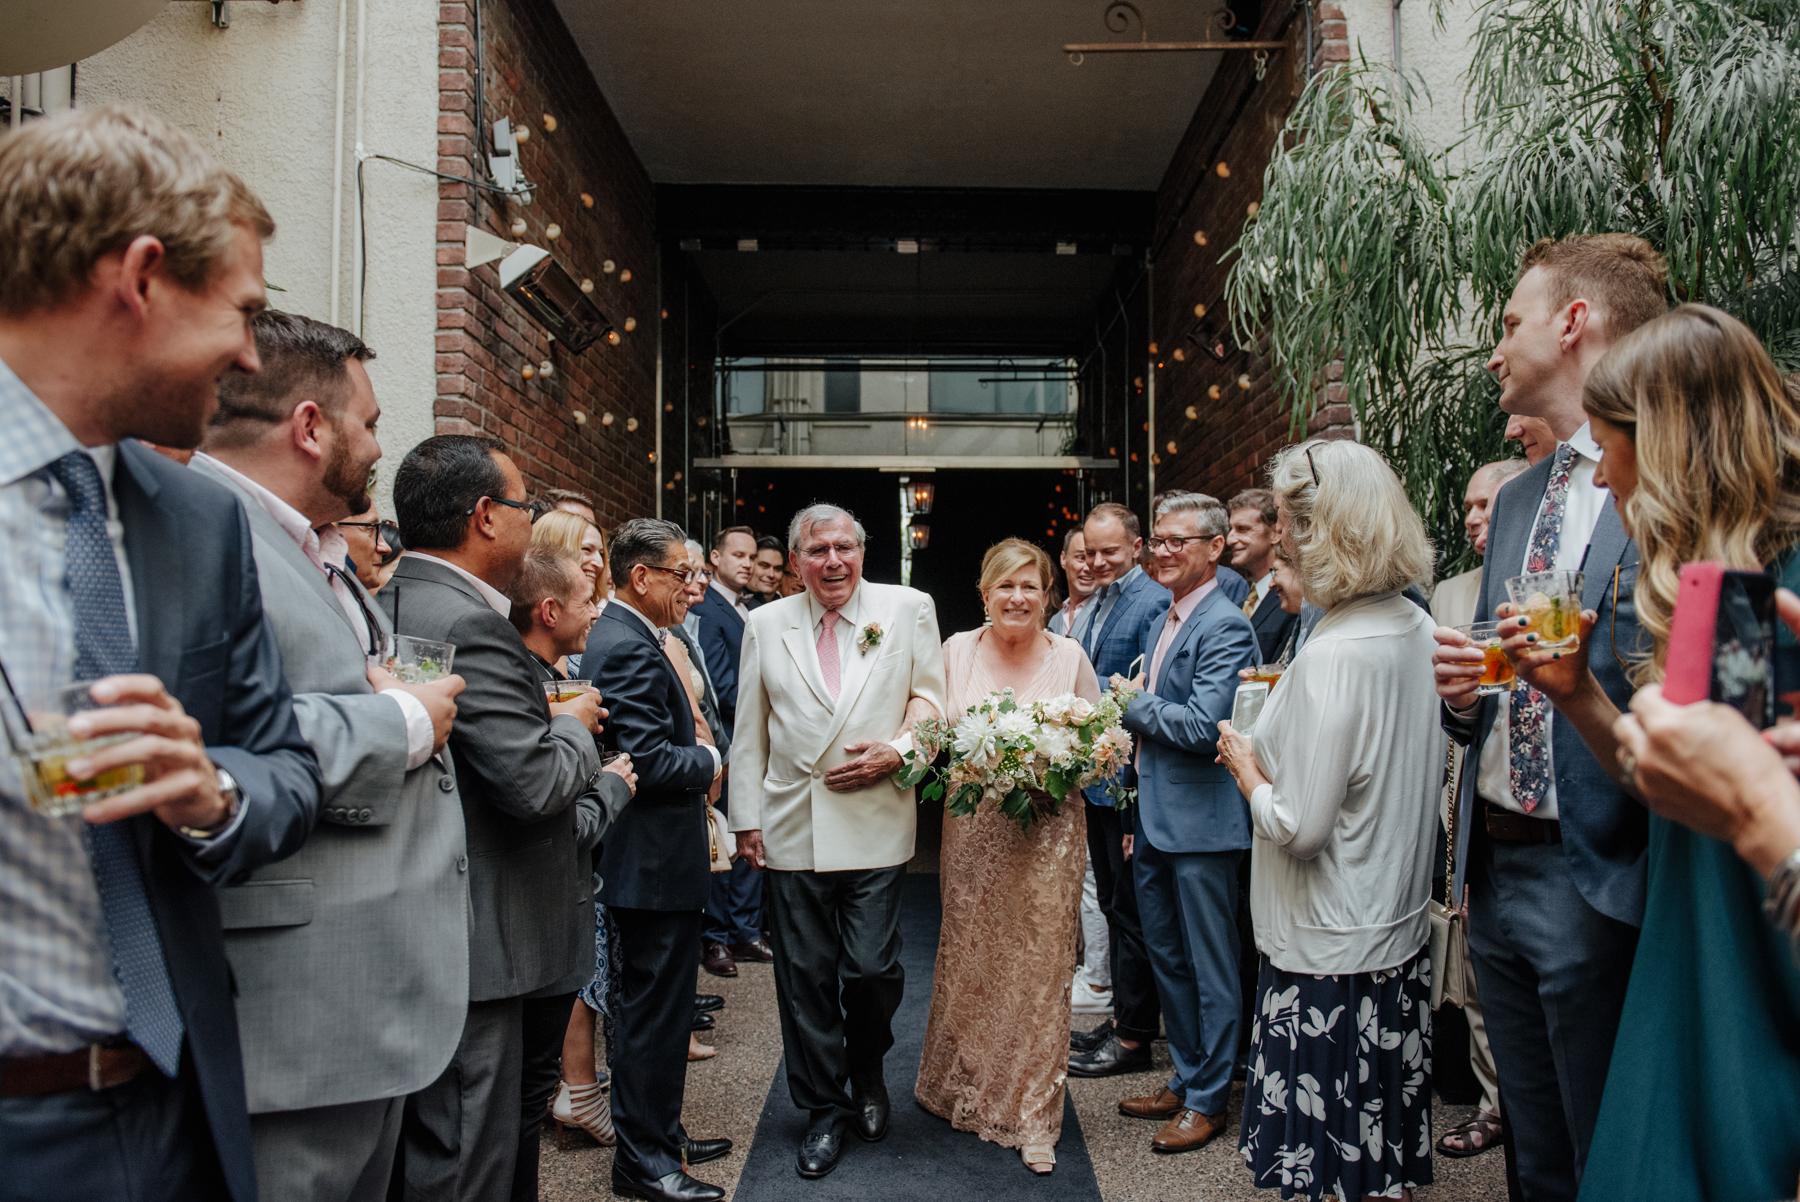 kaoverii_silva_photographer_cynthia_richard_wedding_vancouver_brix_&_mortar-13.jpg